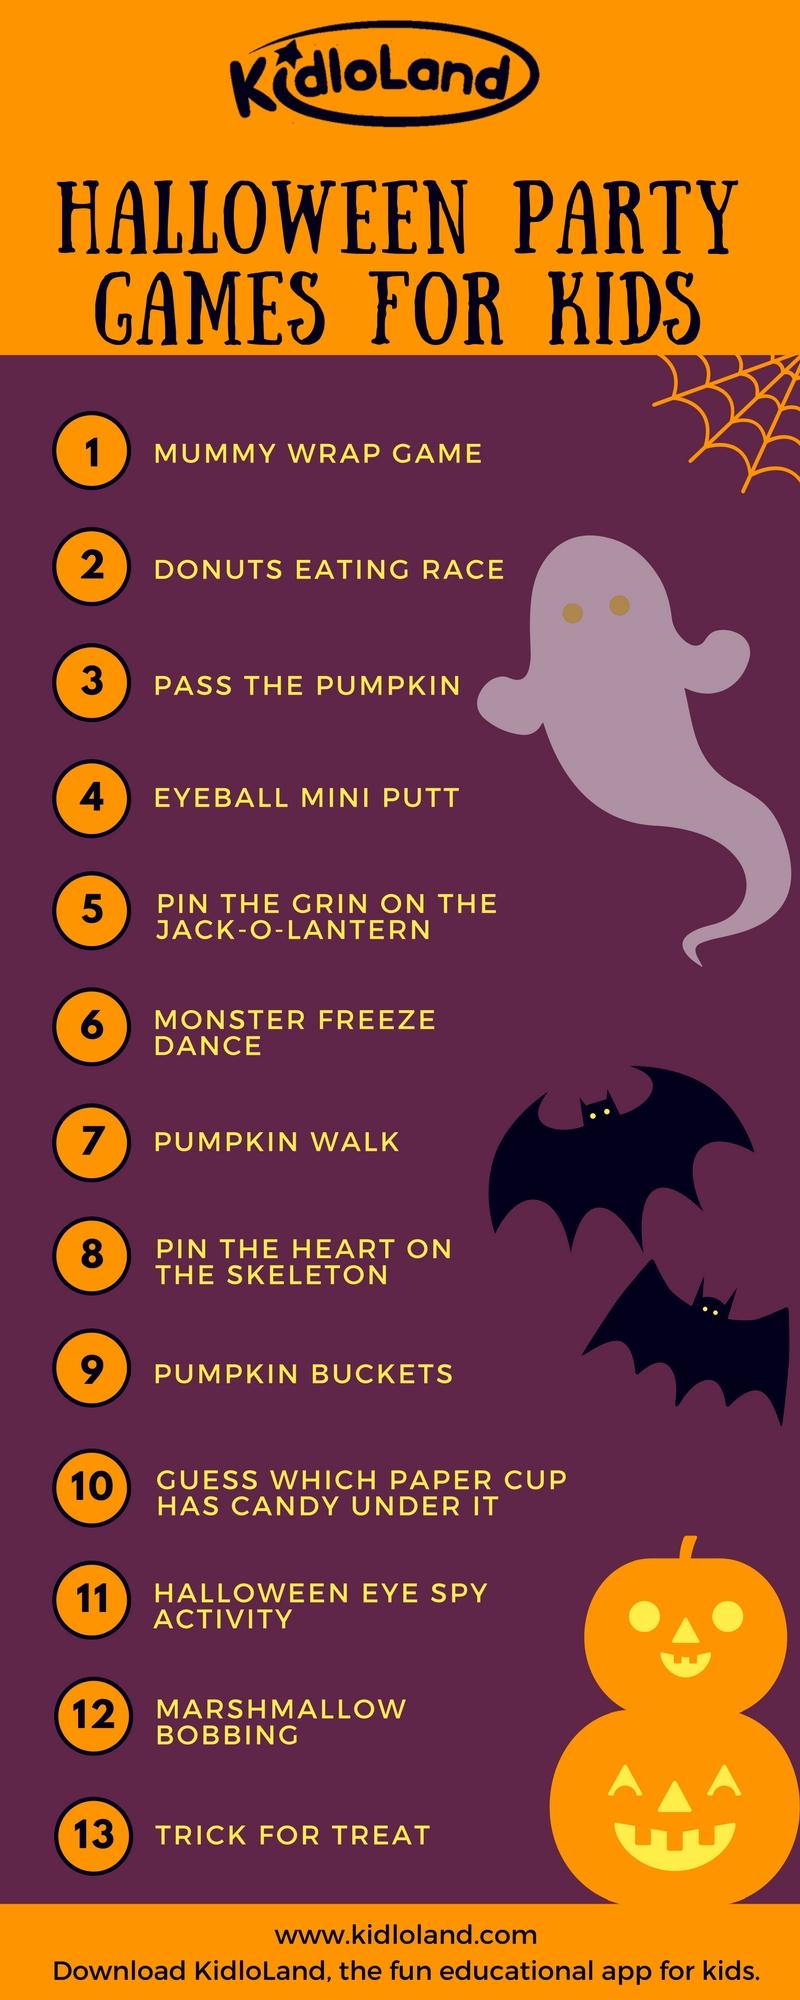 13 fun halloween party